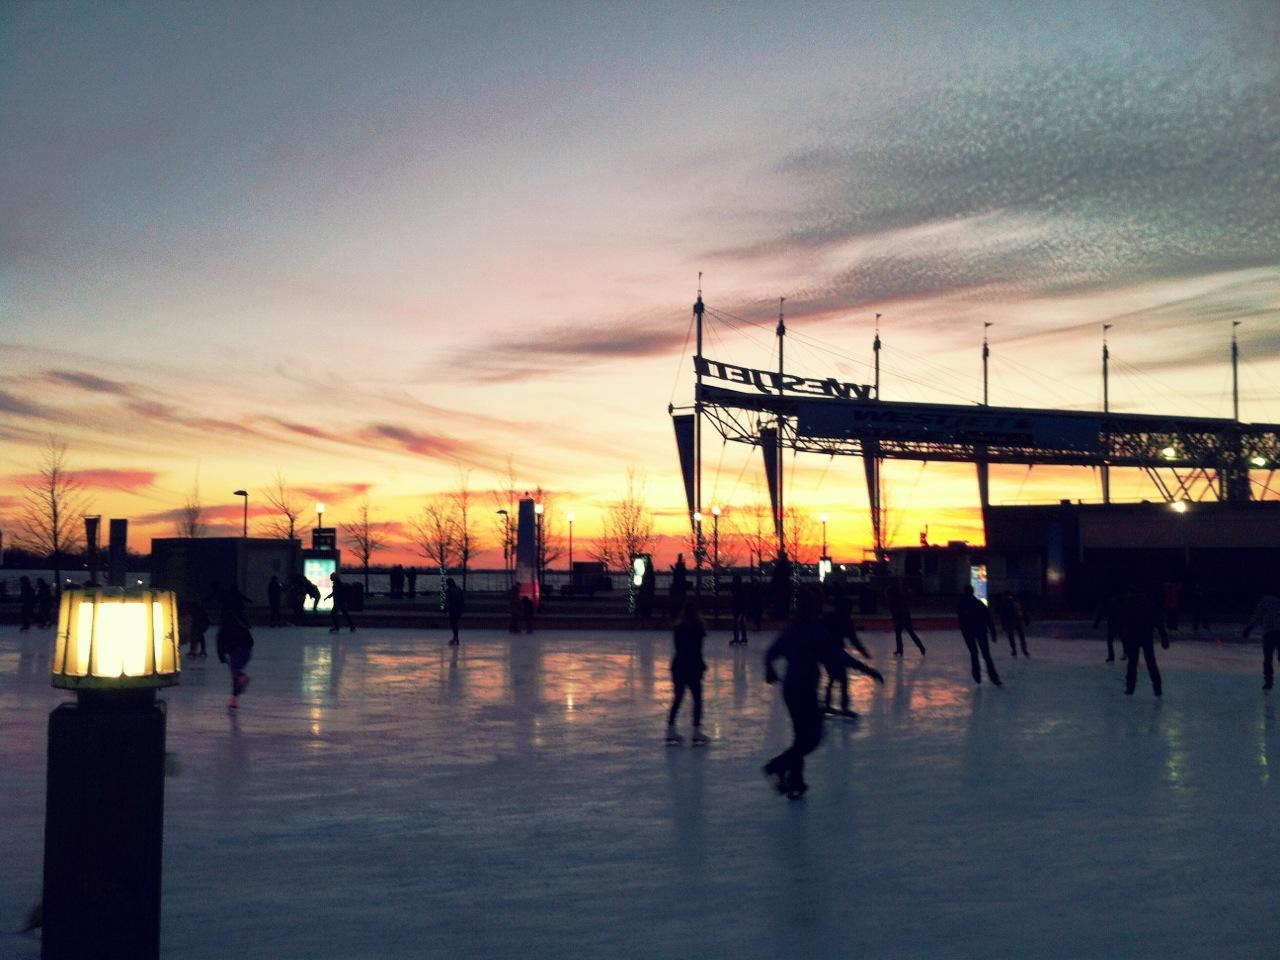 Harbour front centre에서 스케이트타기, 마카롱..